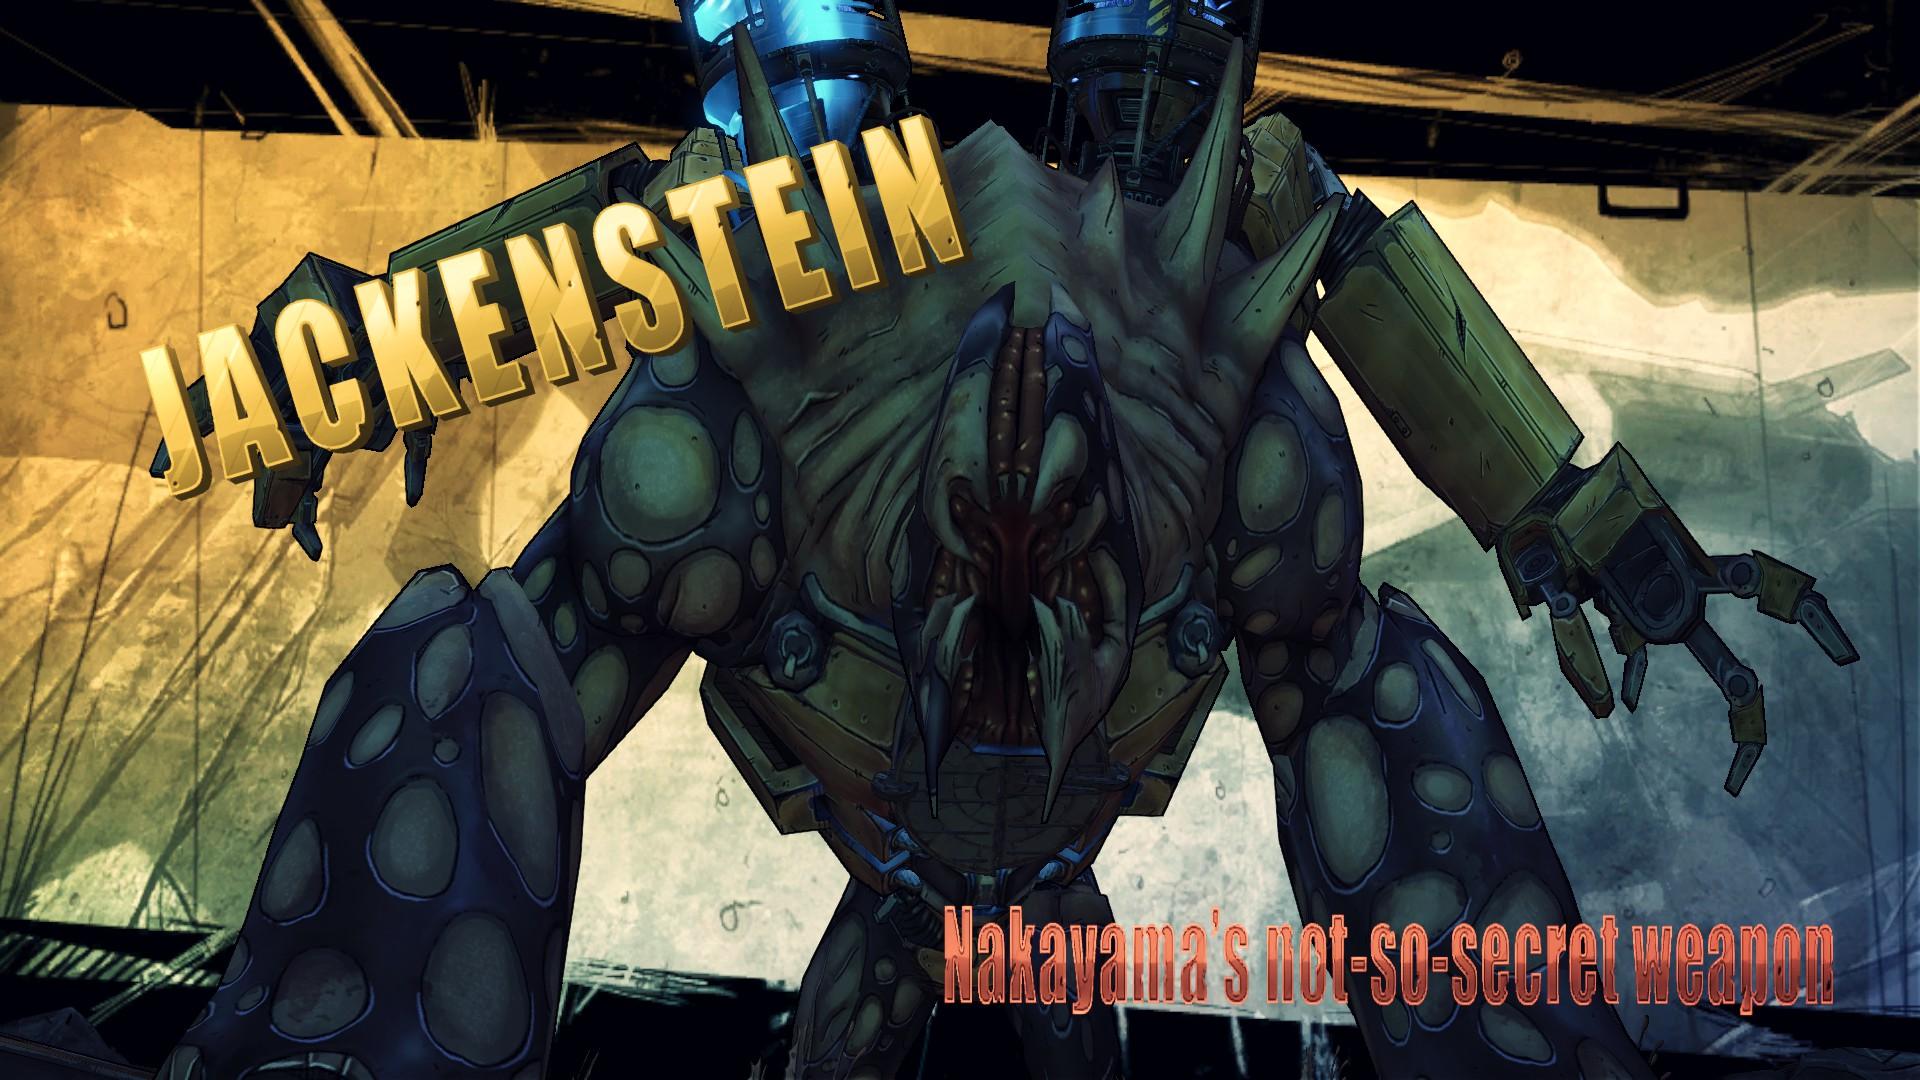 Borderlands 2 can't kill jackenstein